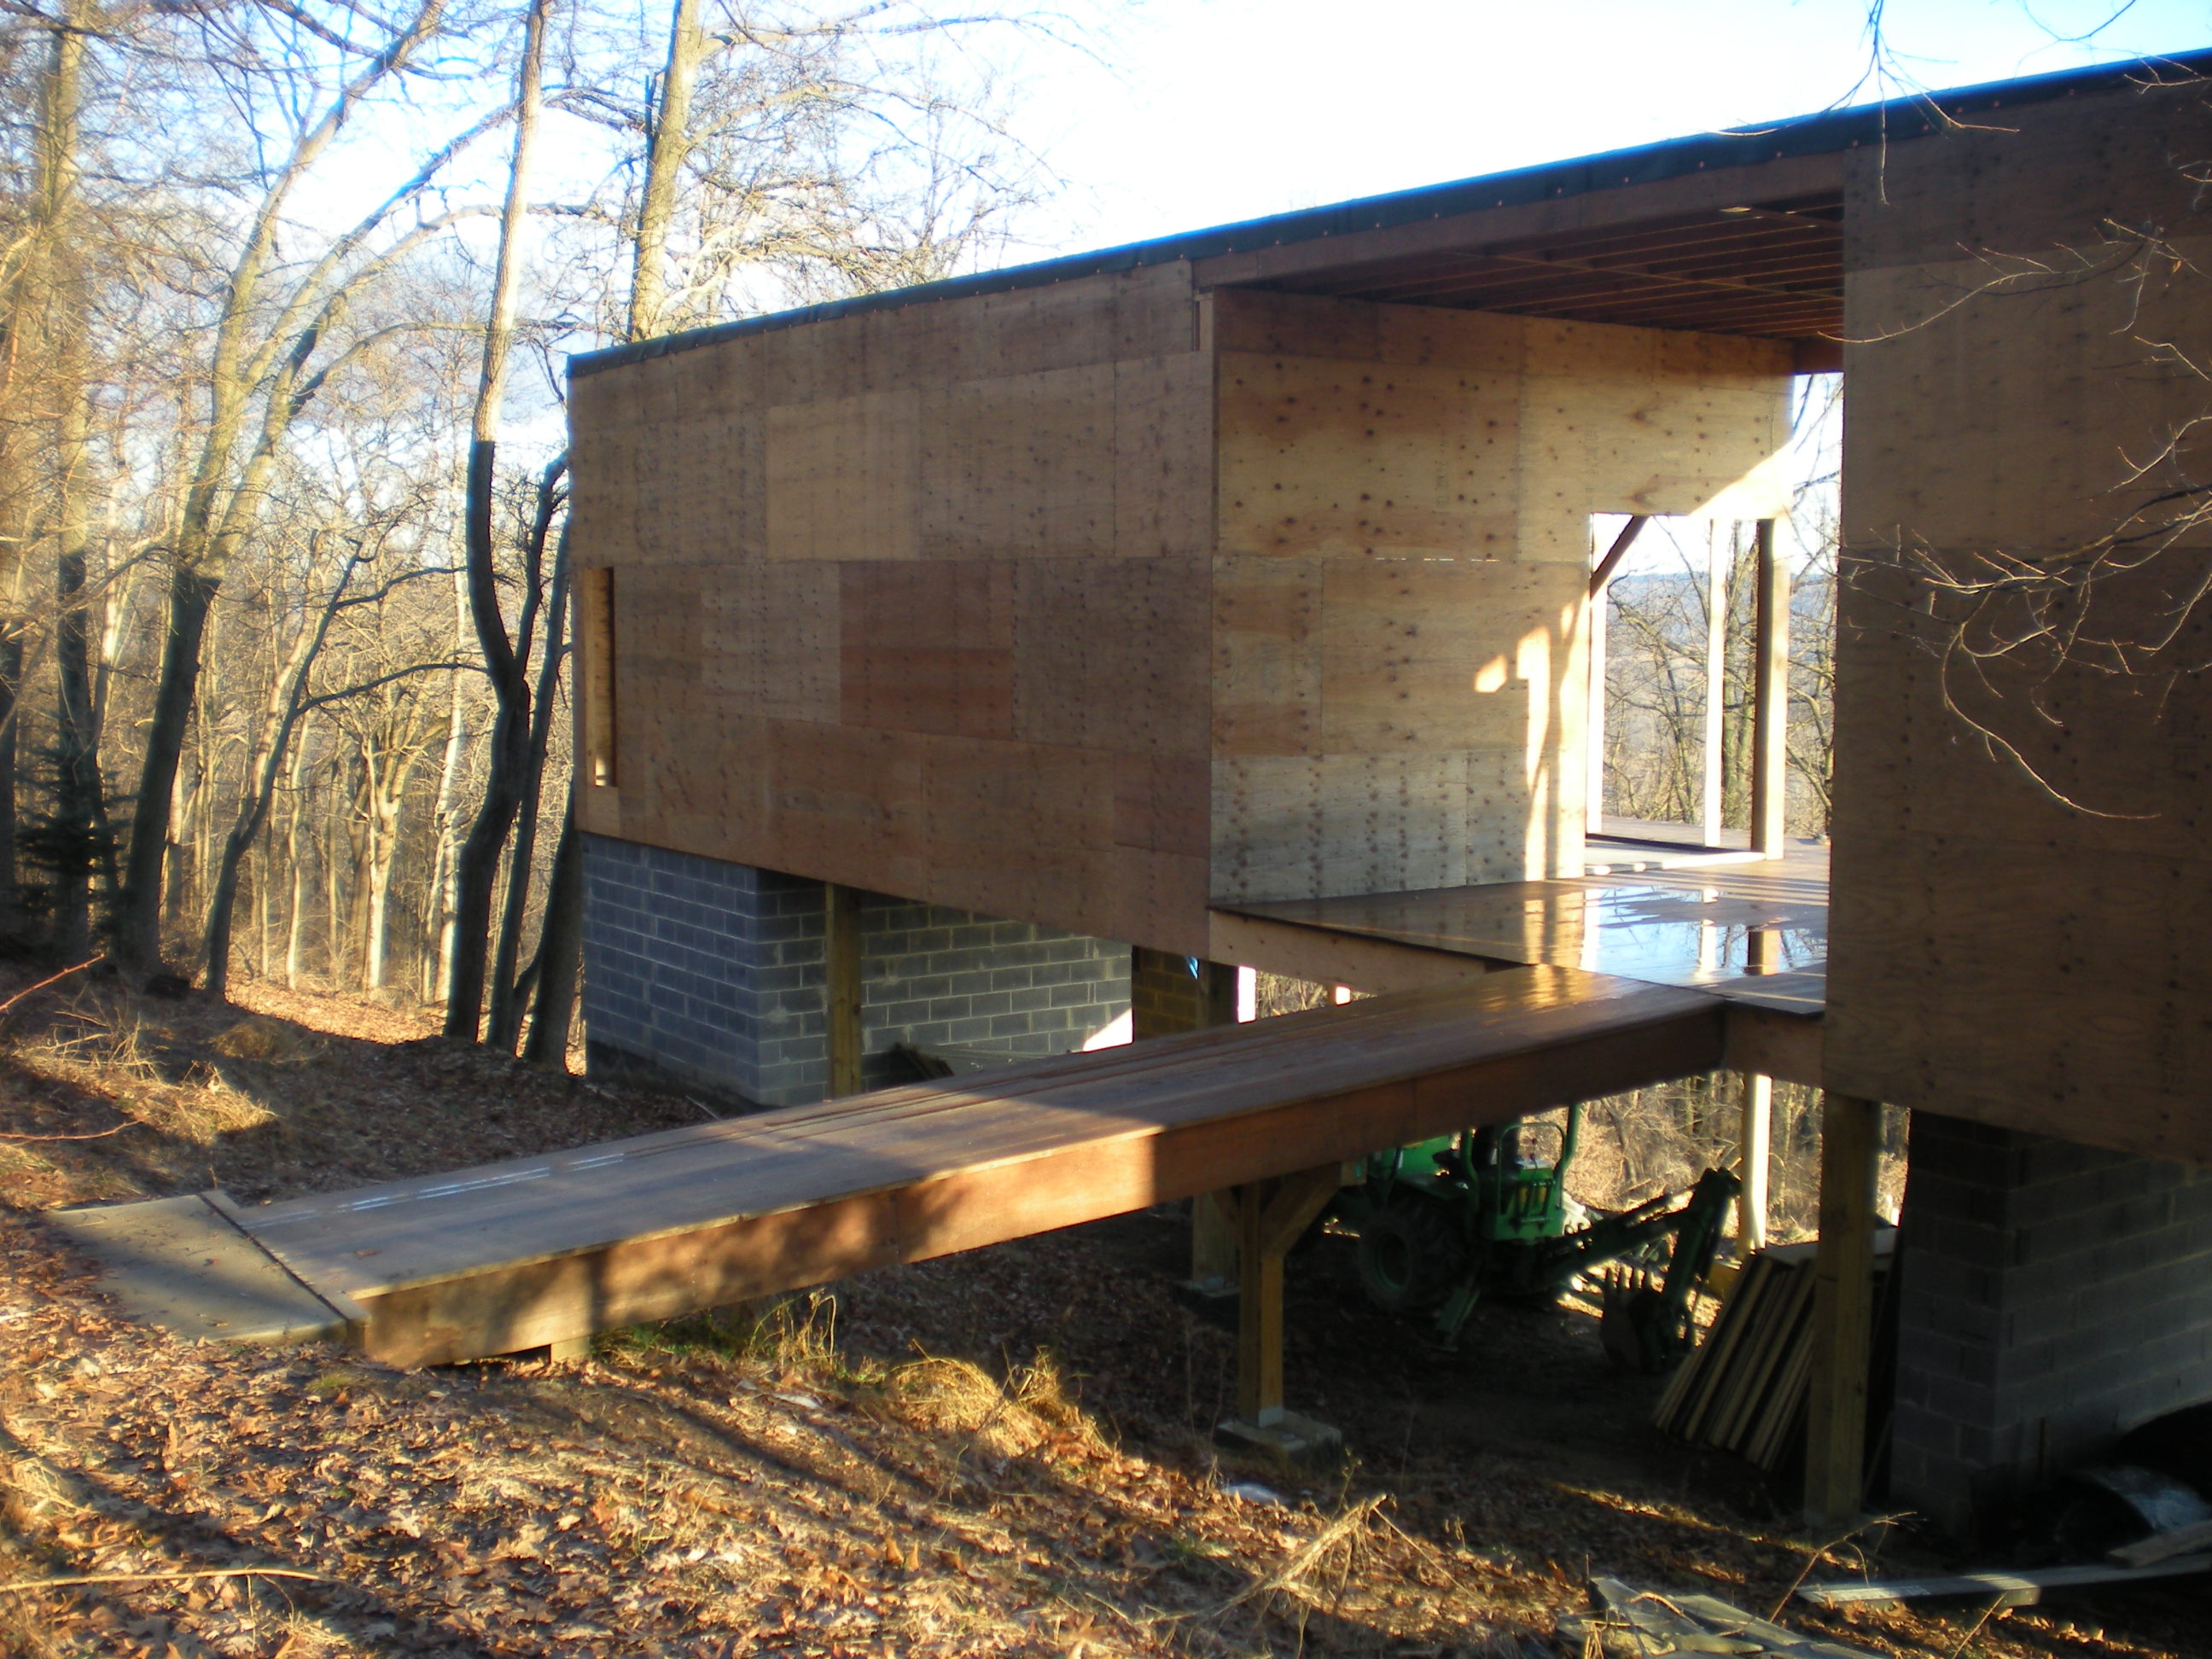 House design victoria - Dscn0717